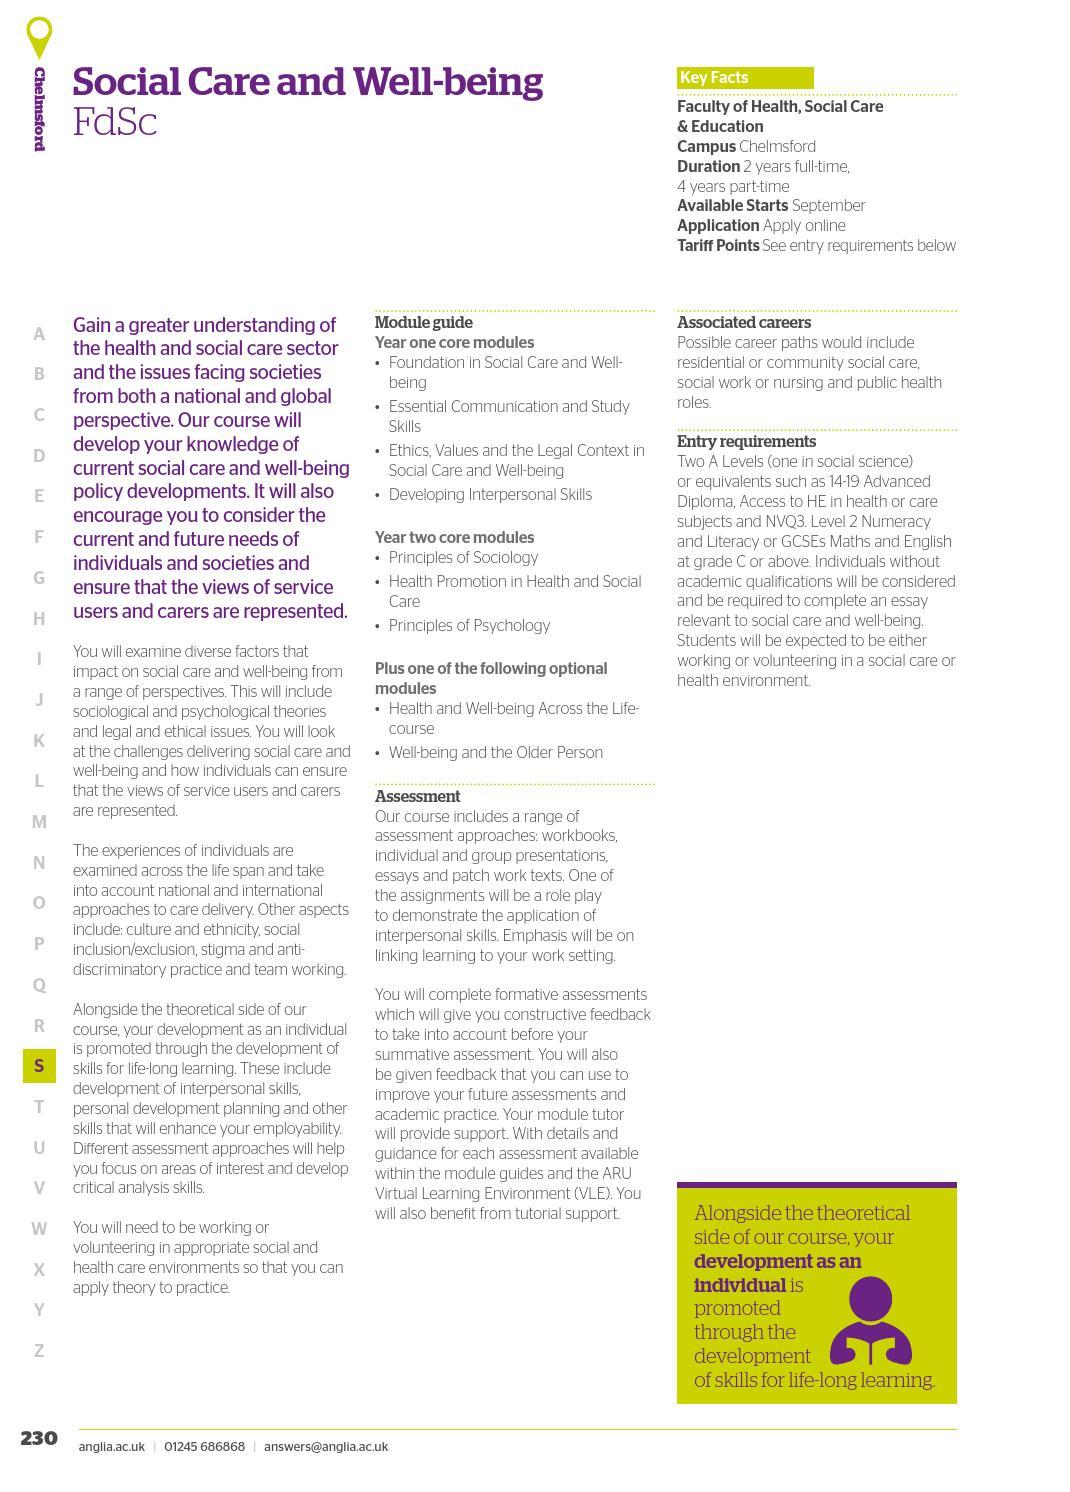 Anglia Ruskin University UG Prospectus 2017-18 by